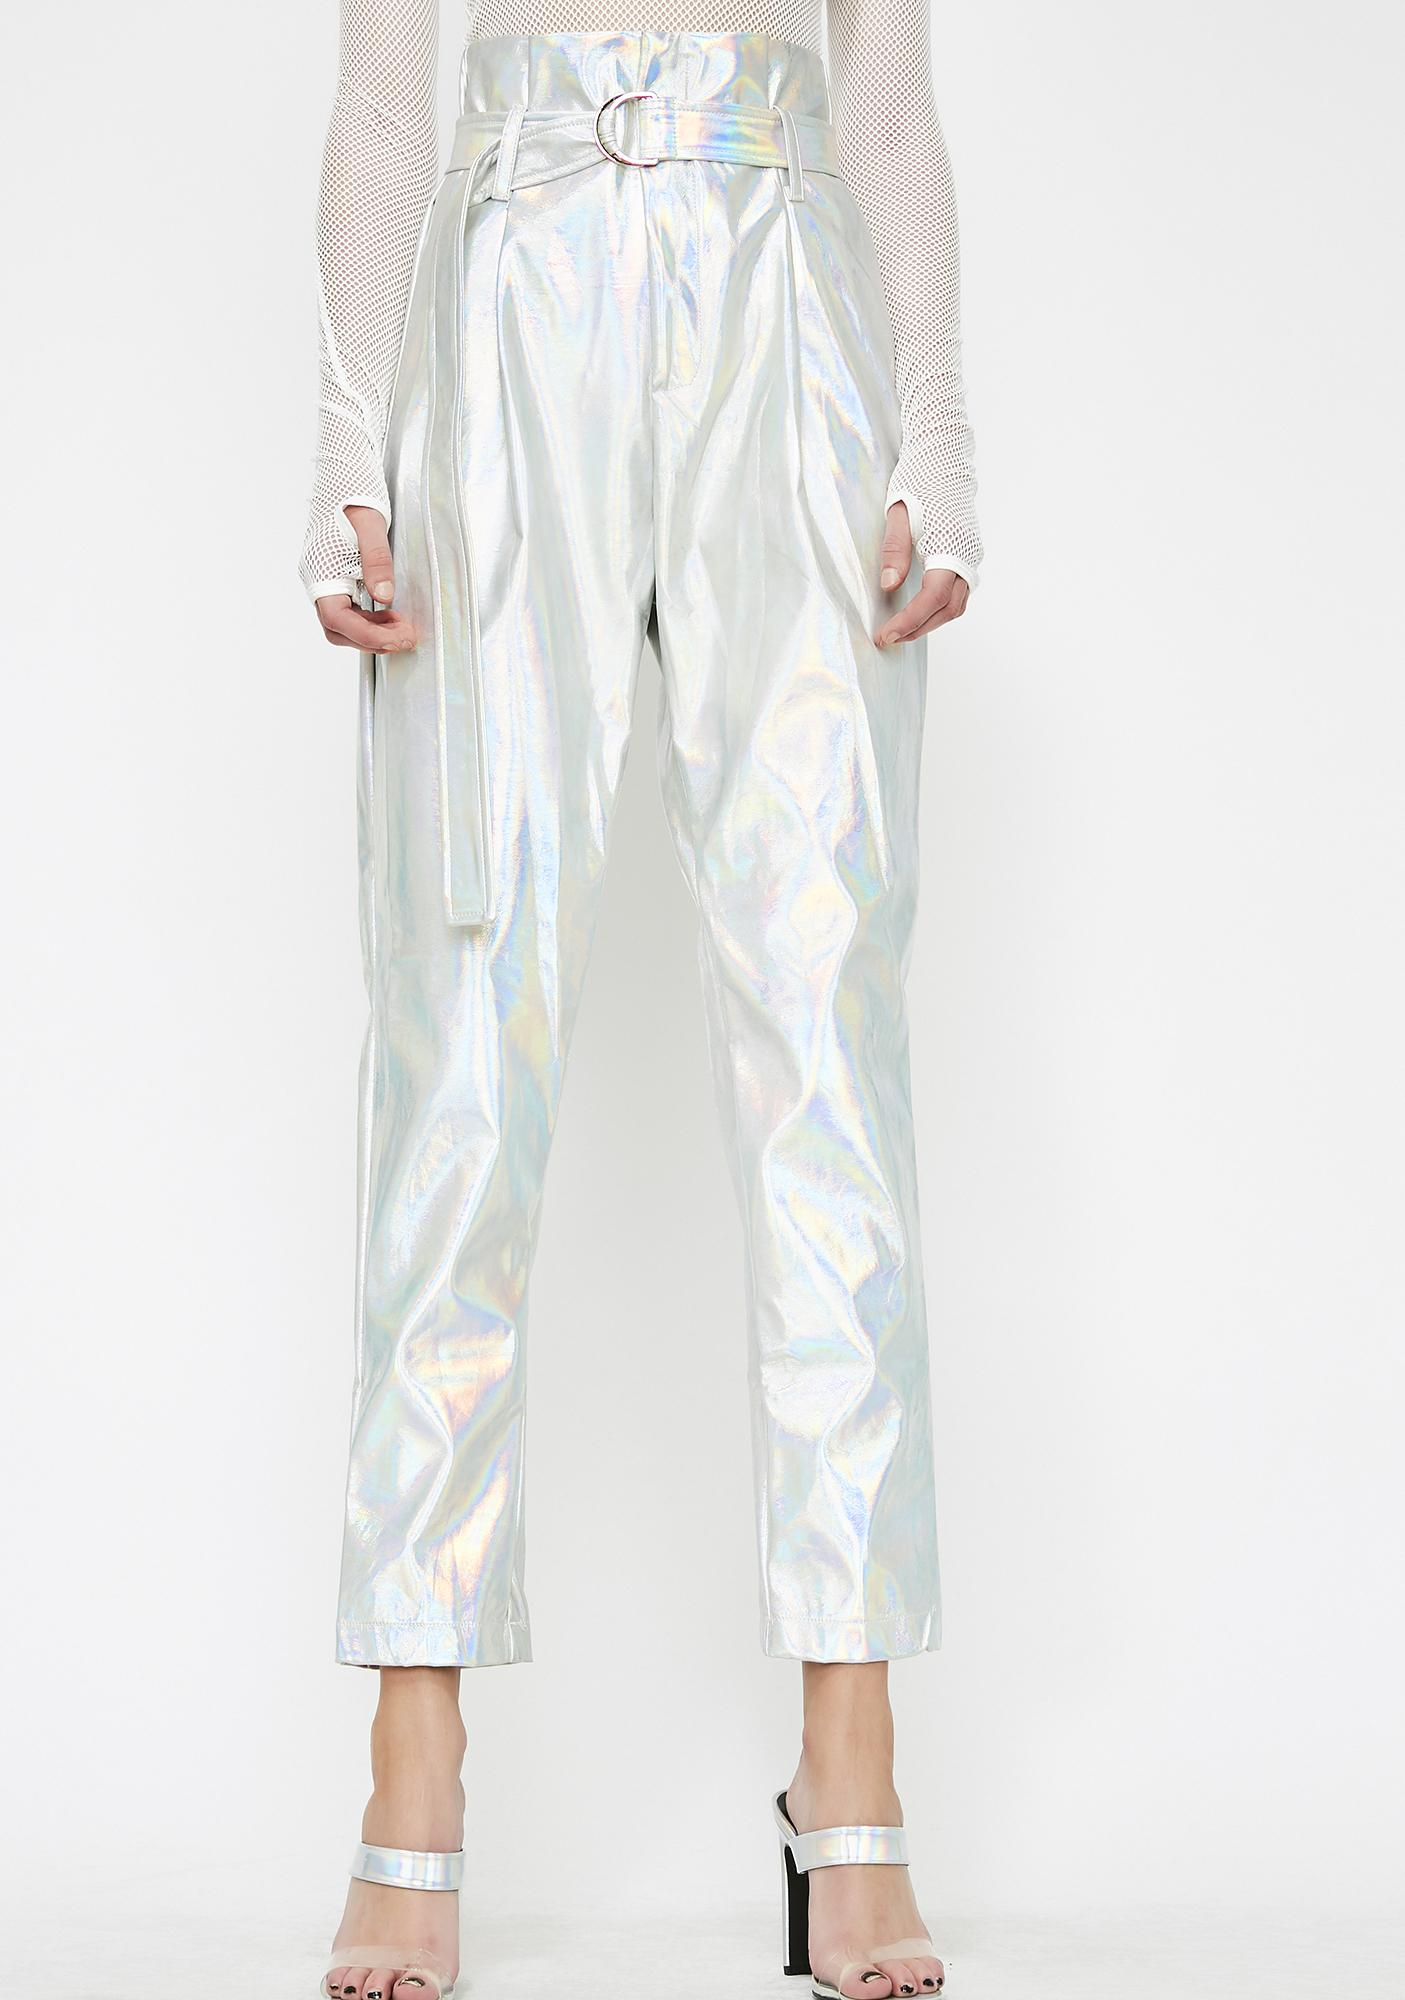 Cosmonaut Holographic Pants